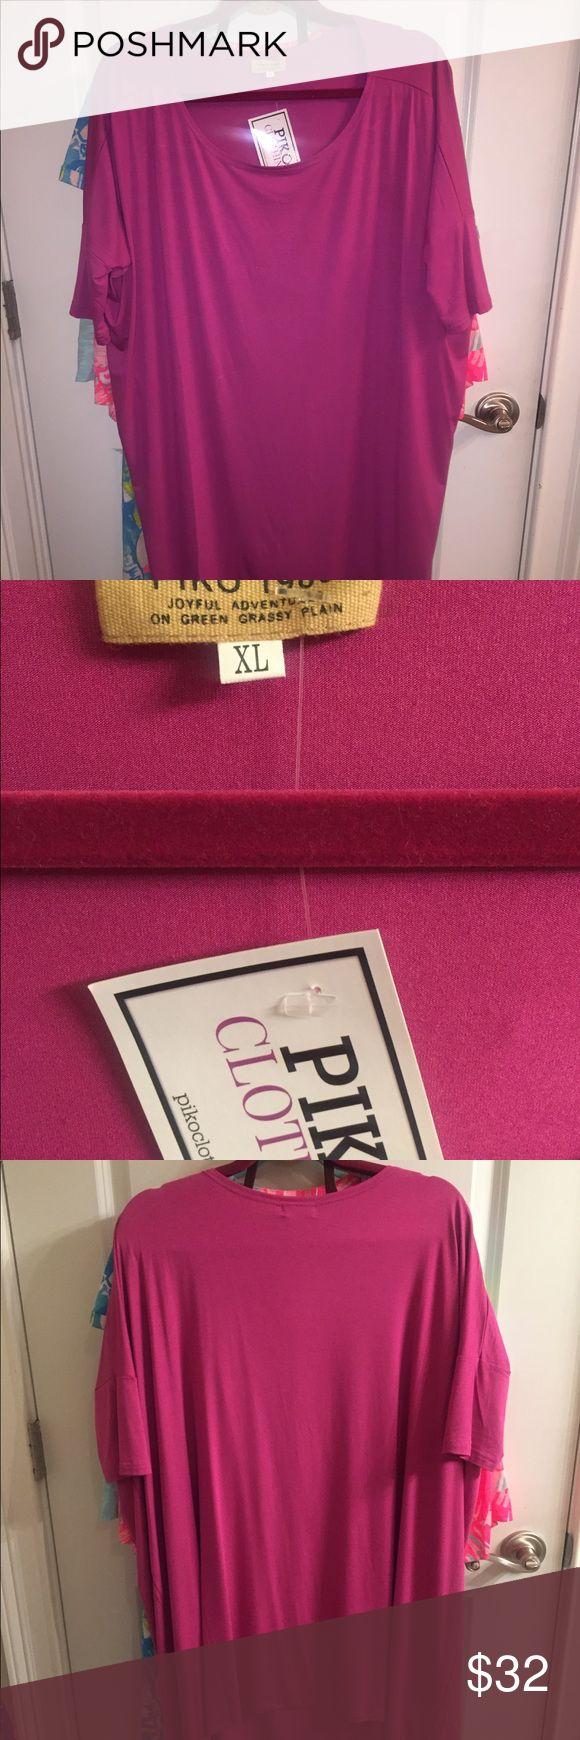 Selling this Orchid piko dress nwt Sz Xl on Poshmark! My username is: margo943. #shopmycloset #poshmark #fashion #shopping #style #forsale #Piko 1988 #Dresses & Skirts